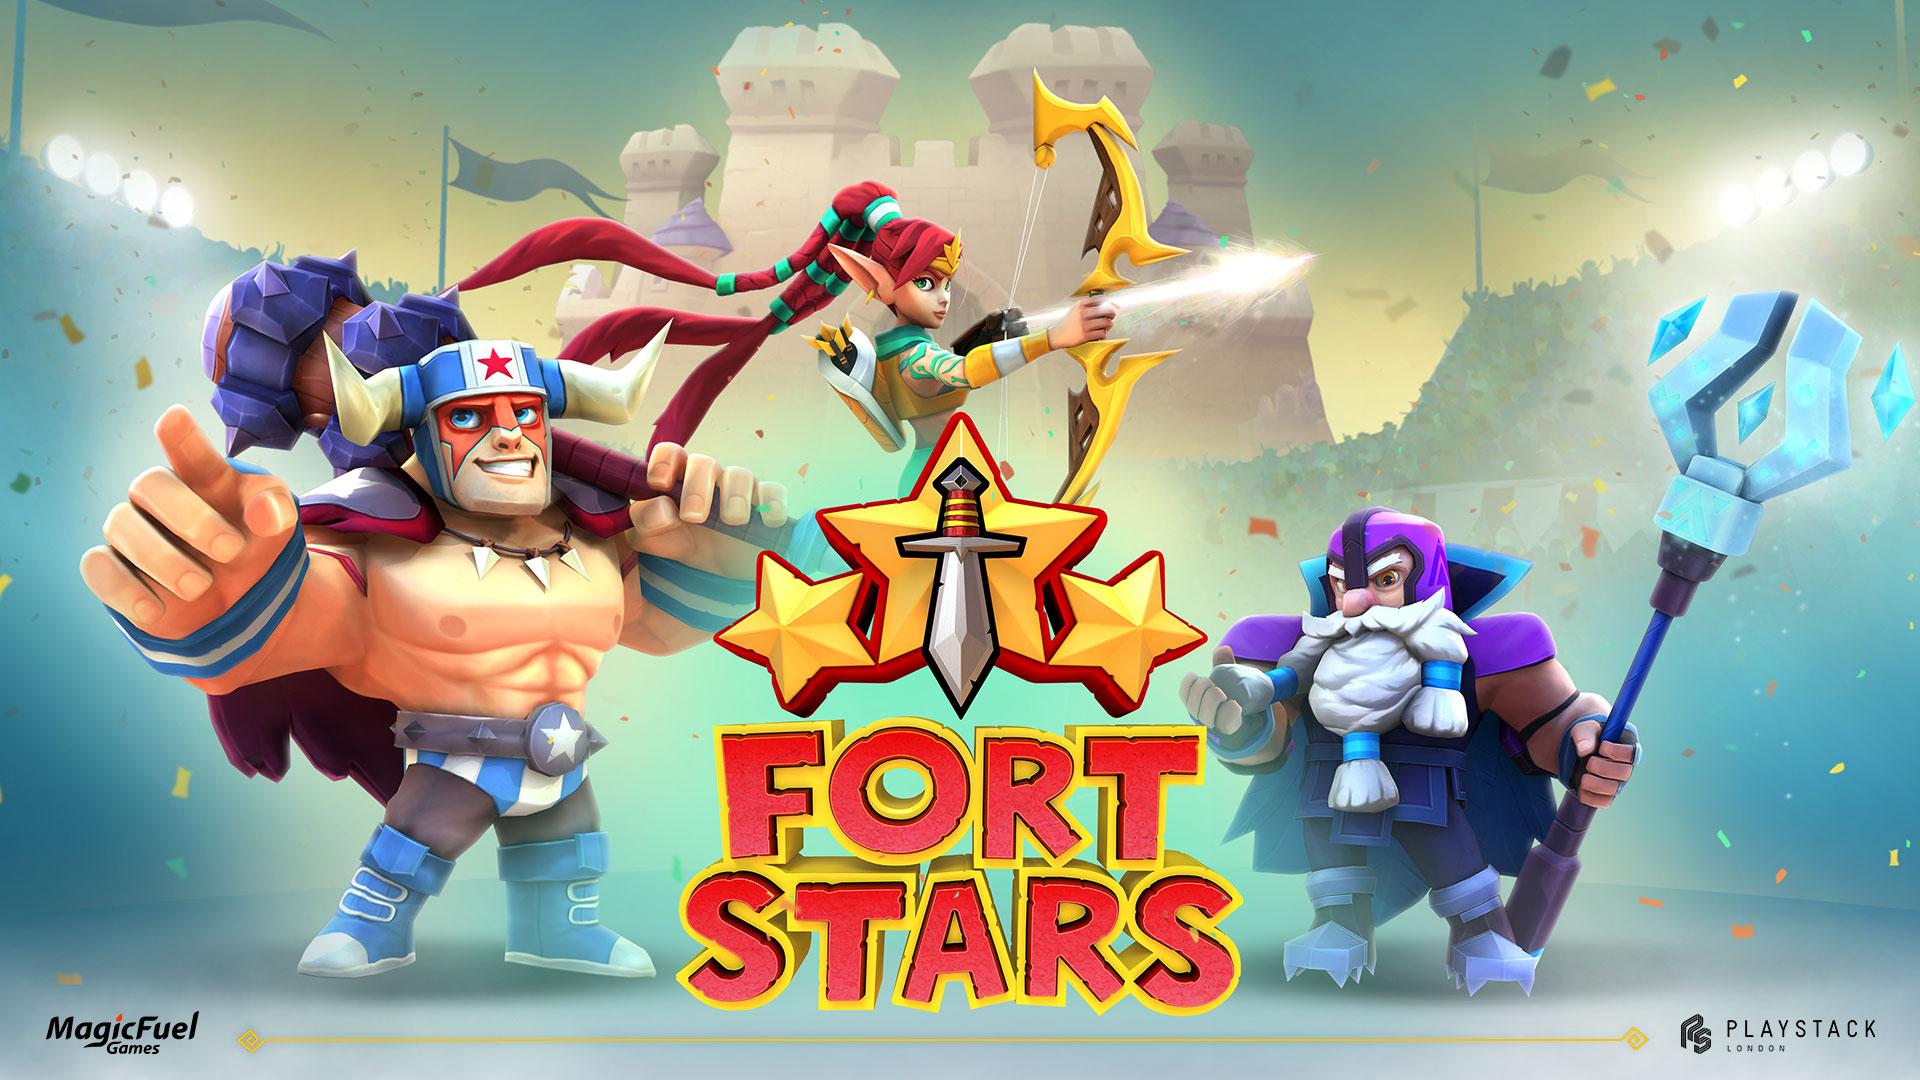 Fort_Stars_Welcome.jpg